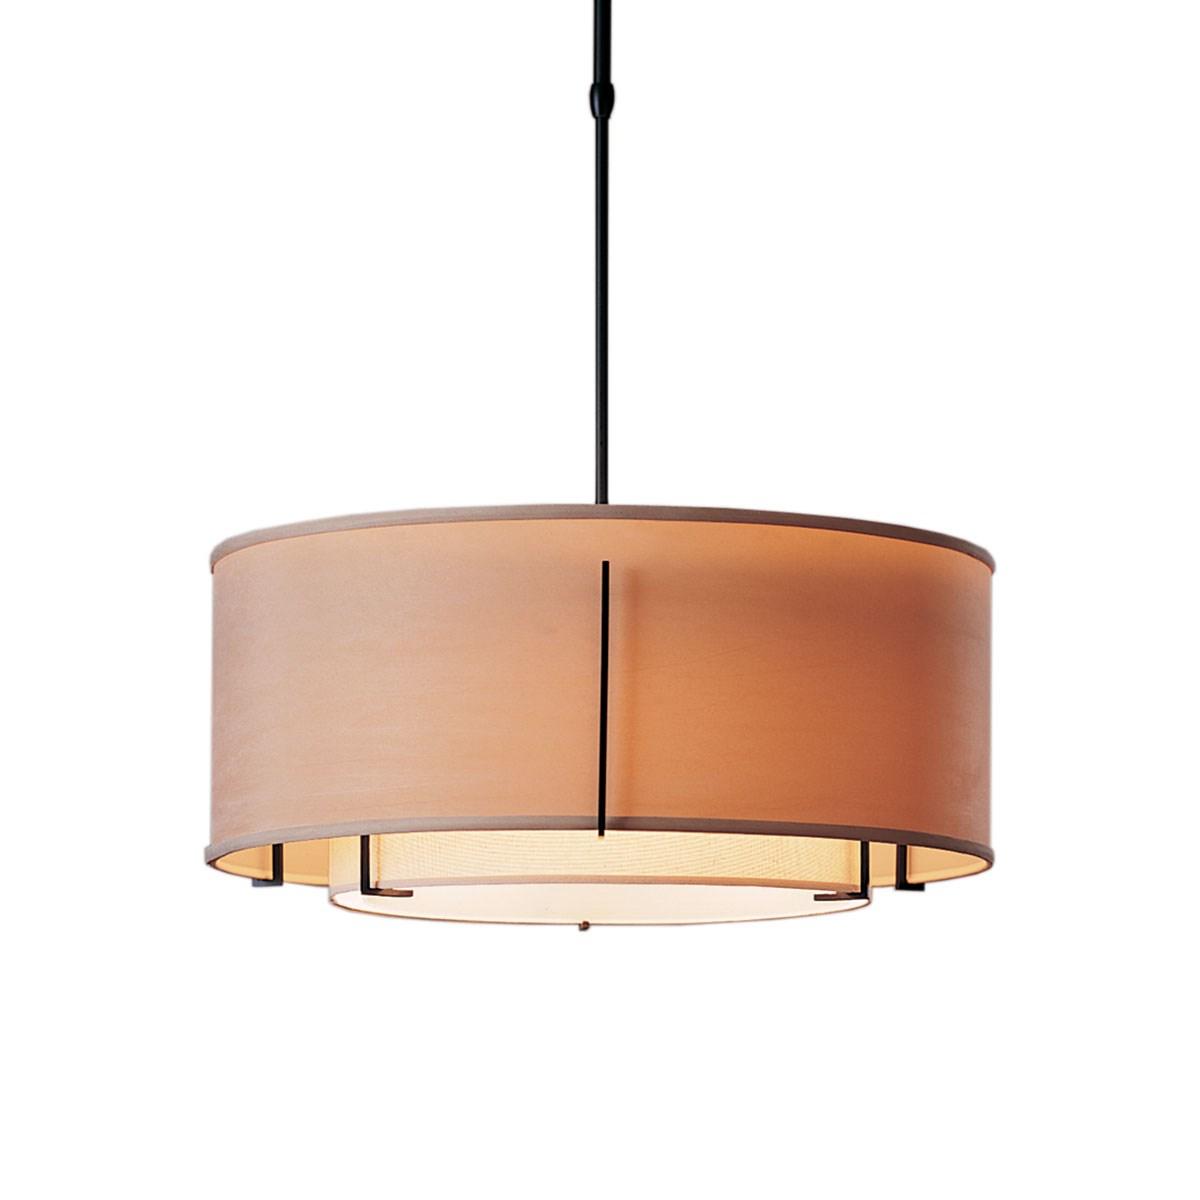 Neenas knows Lighting: Modern Lighting, Transitional Lighting ...